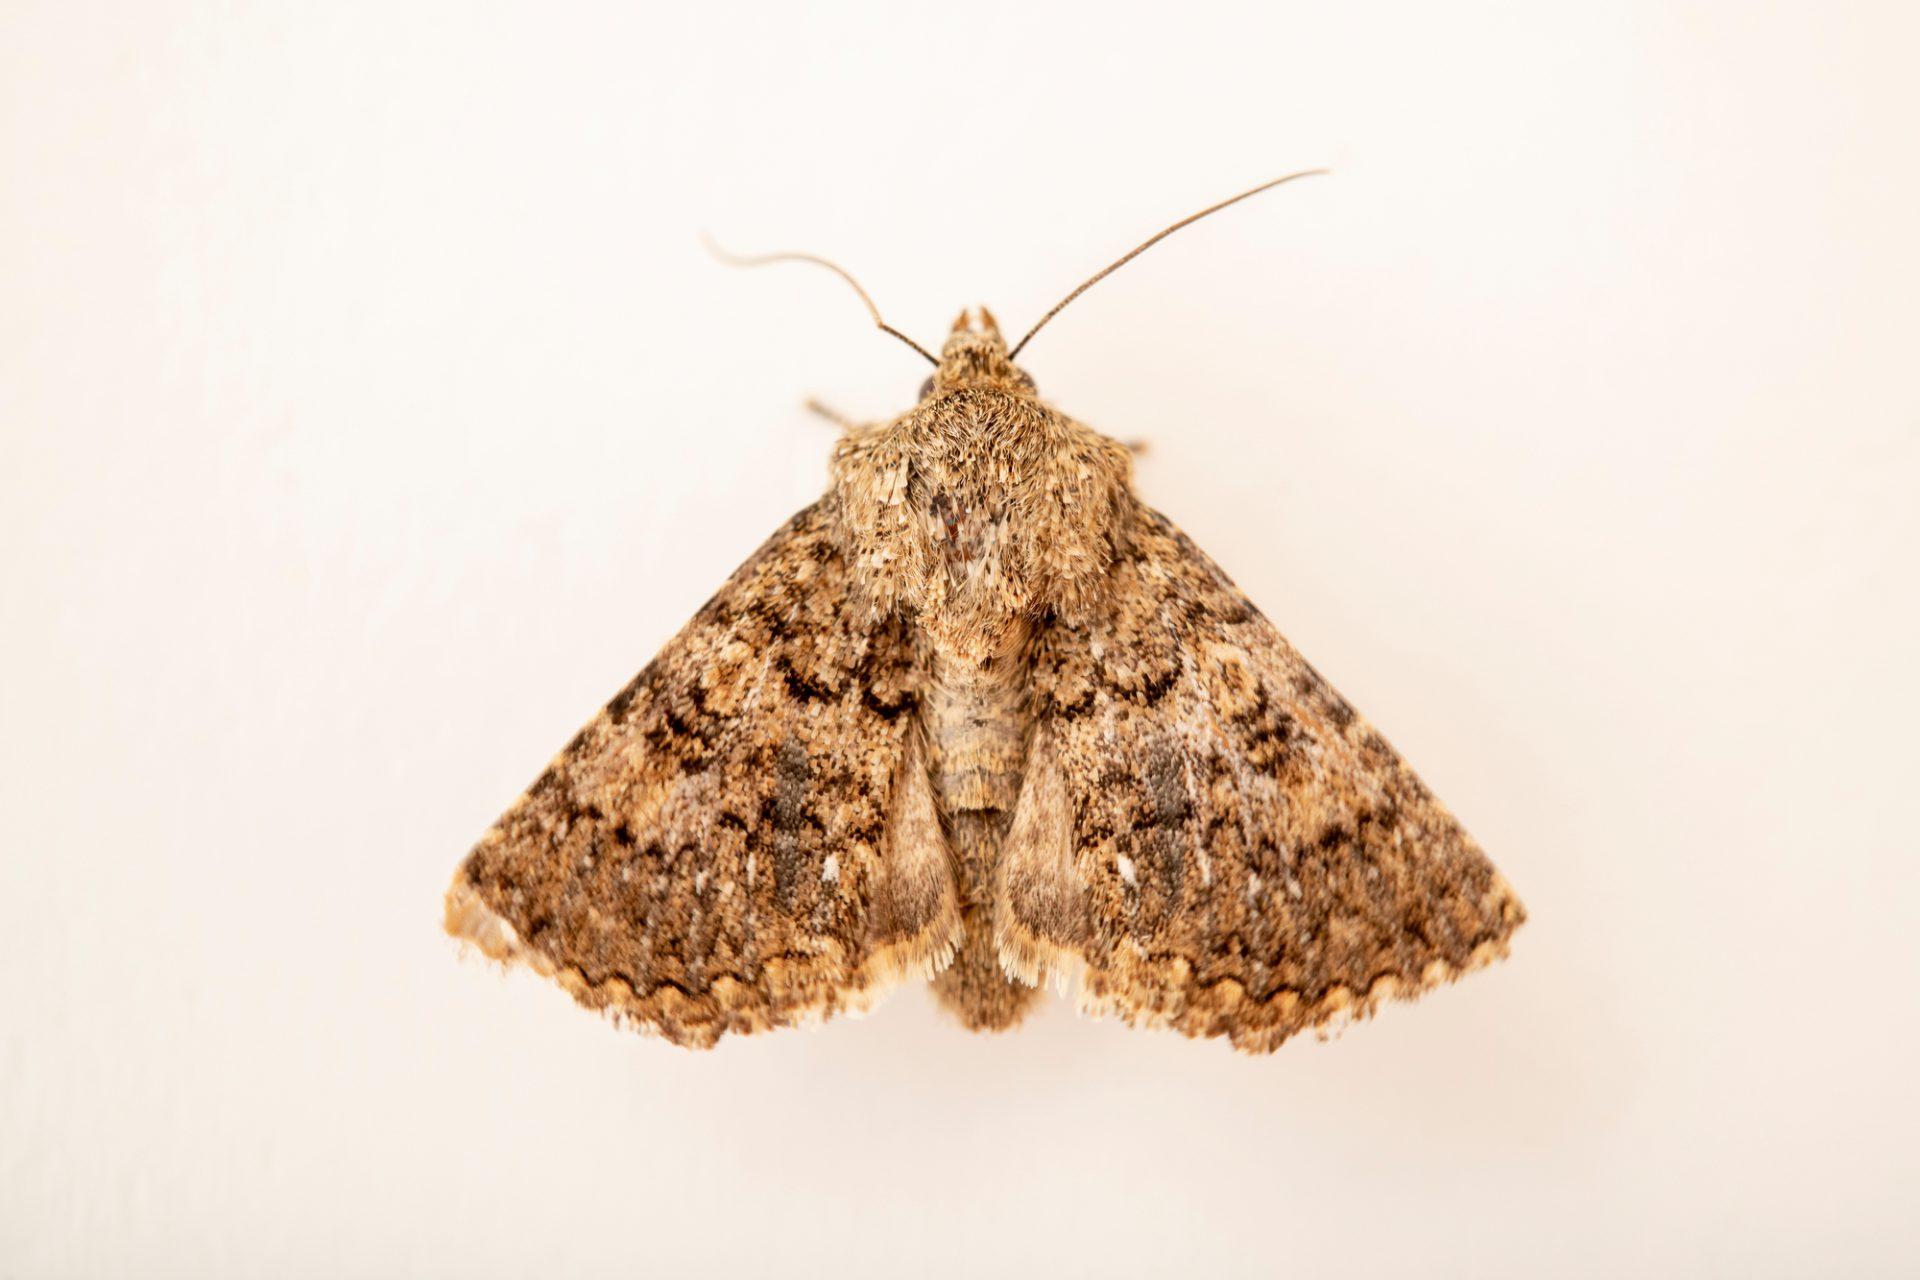 Photo: An unidentified moth (Noctuidae sp.) at Graham's Quinta dos Malvedos Vineyard.